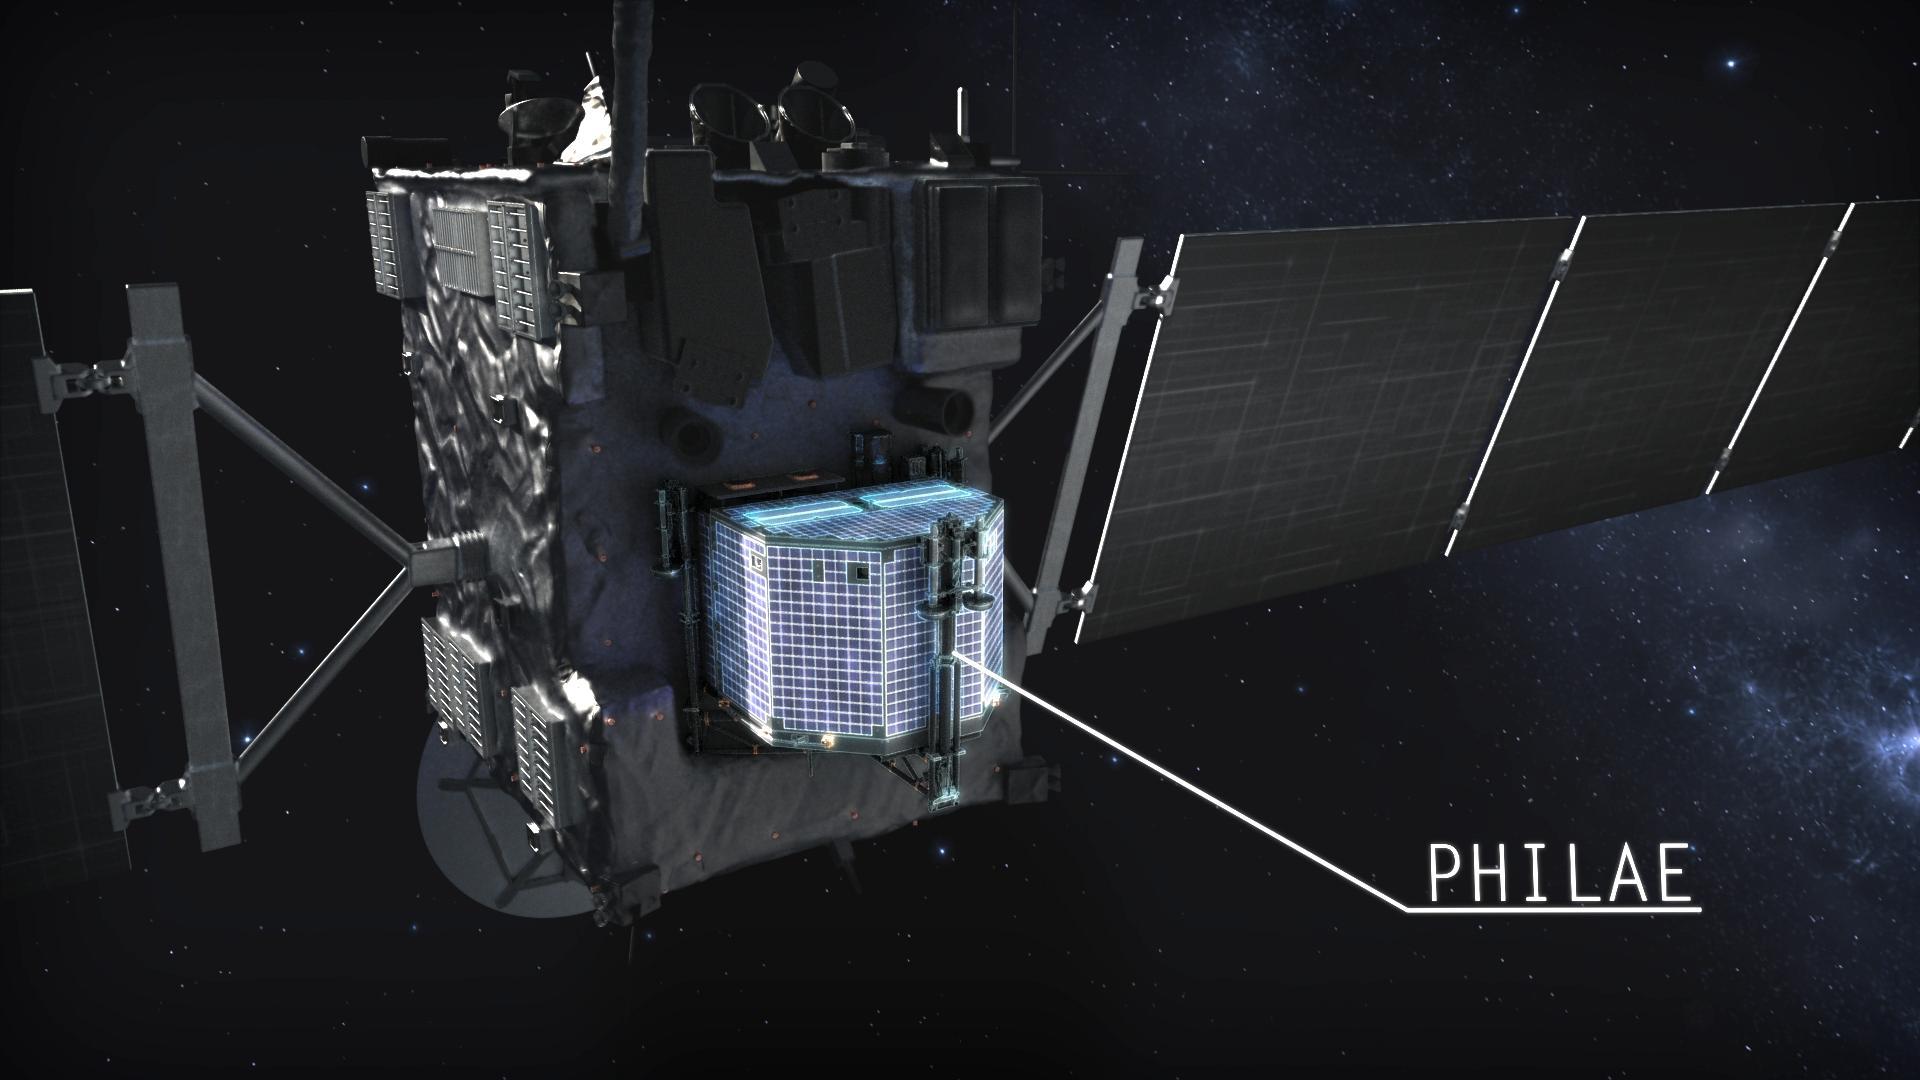 Rosetta mit Philae - ©DLR German Aerospace - http://www.flickr.com/photos/dlr_de/11963777196/